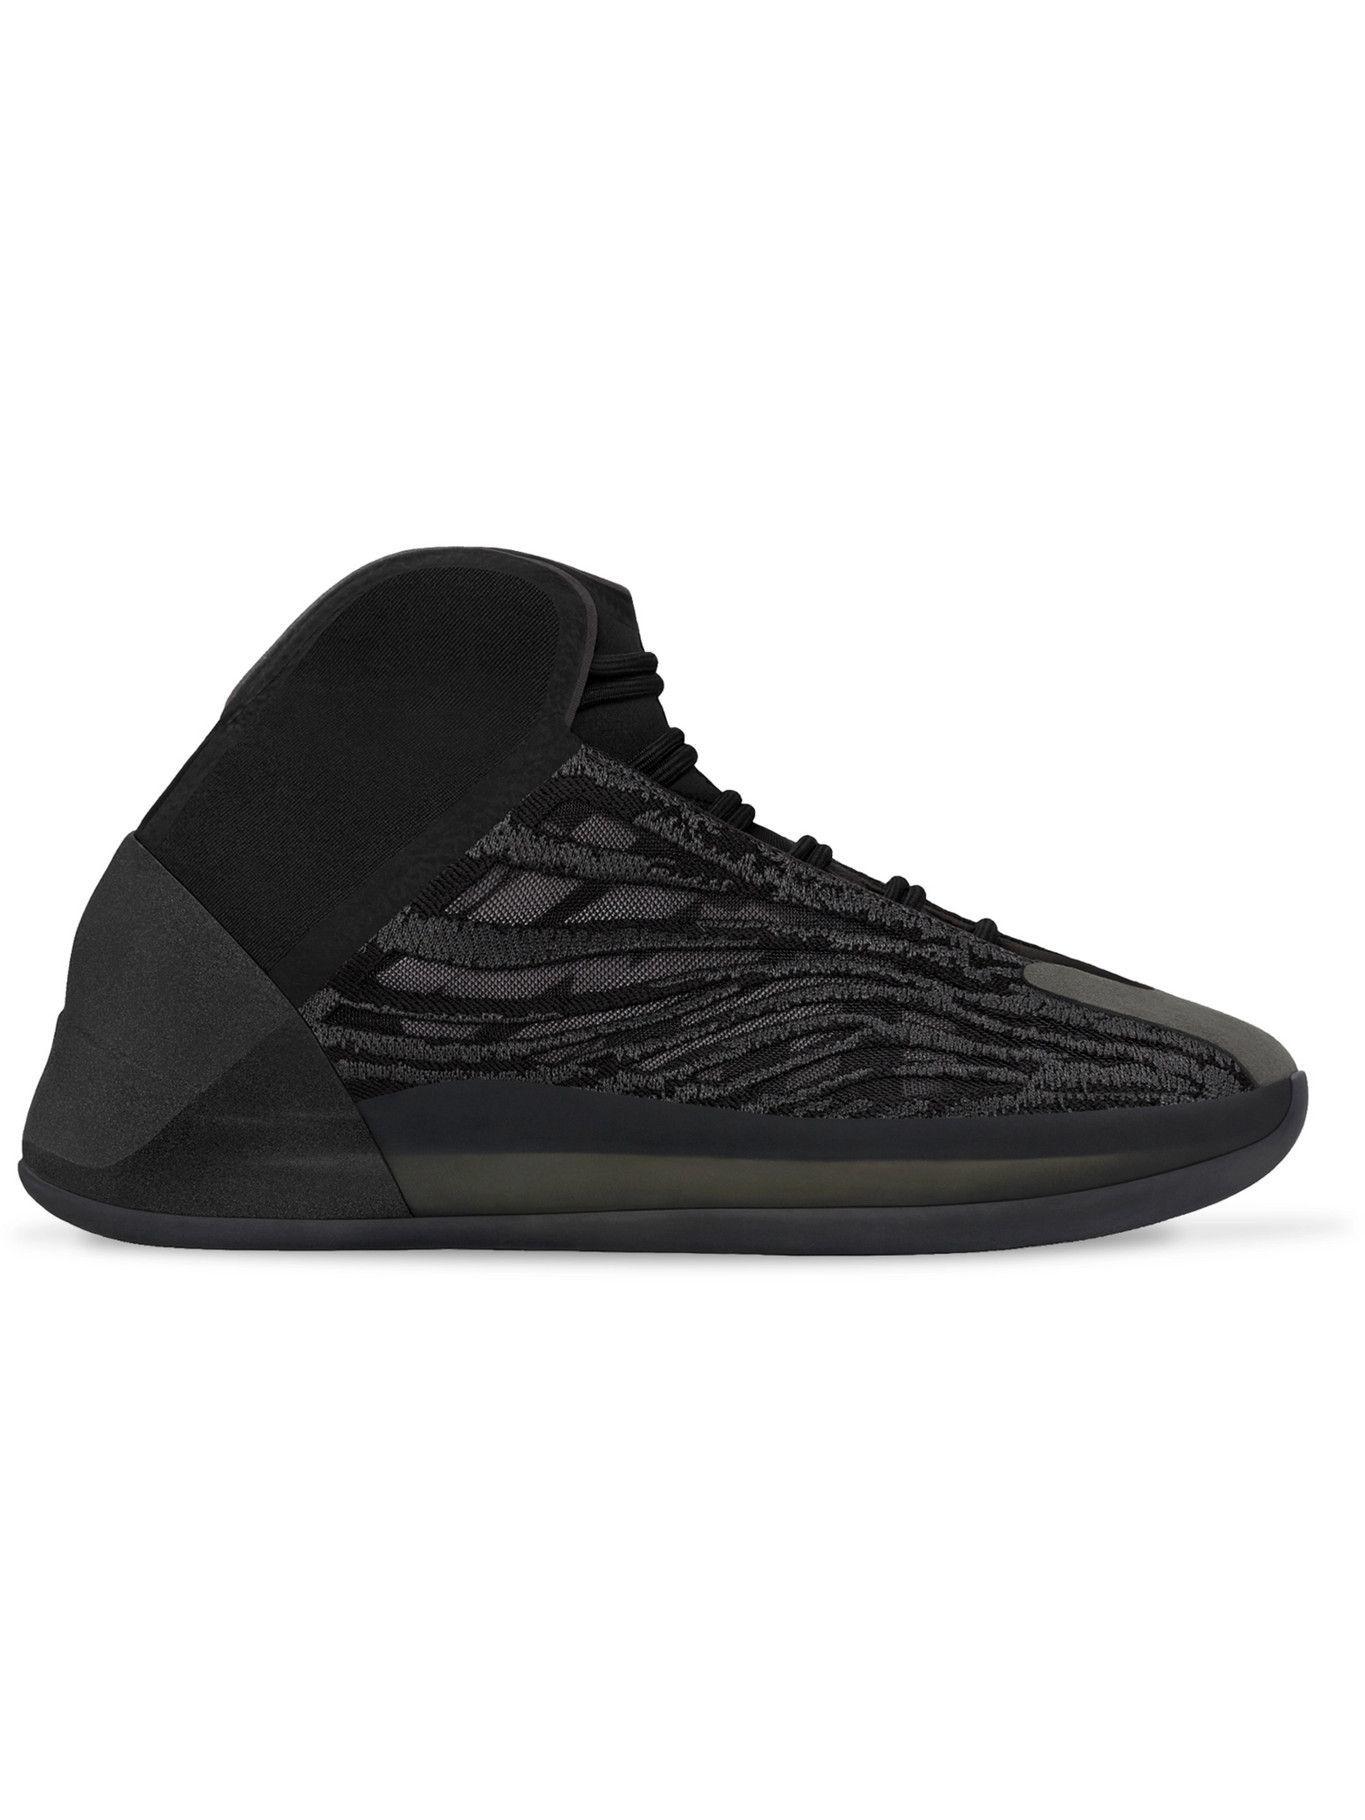 Photo: adidas Originals - Yeezy QNTM Primeknit, Mesh and Nubuck Sneakers - Black